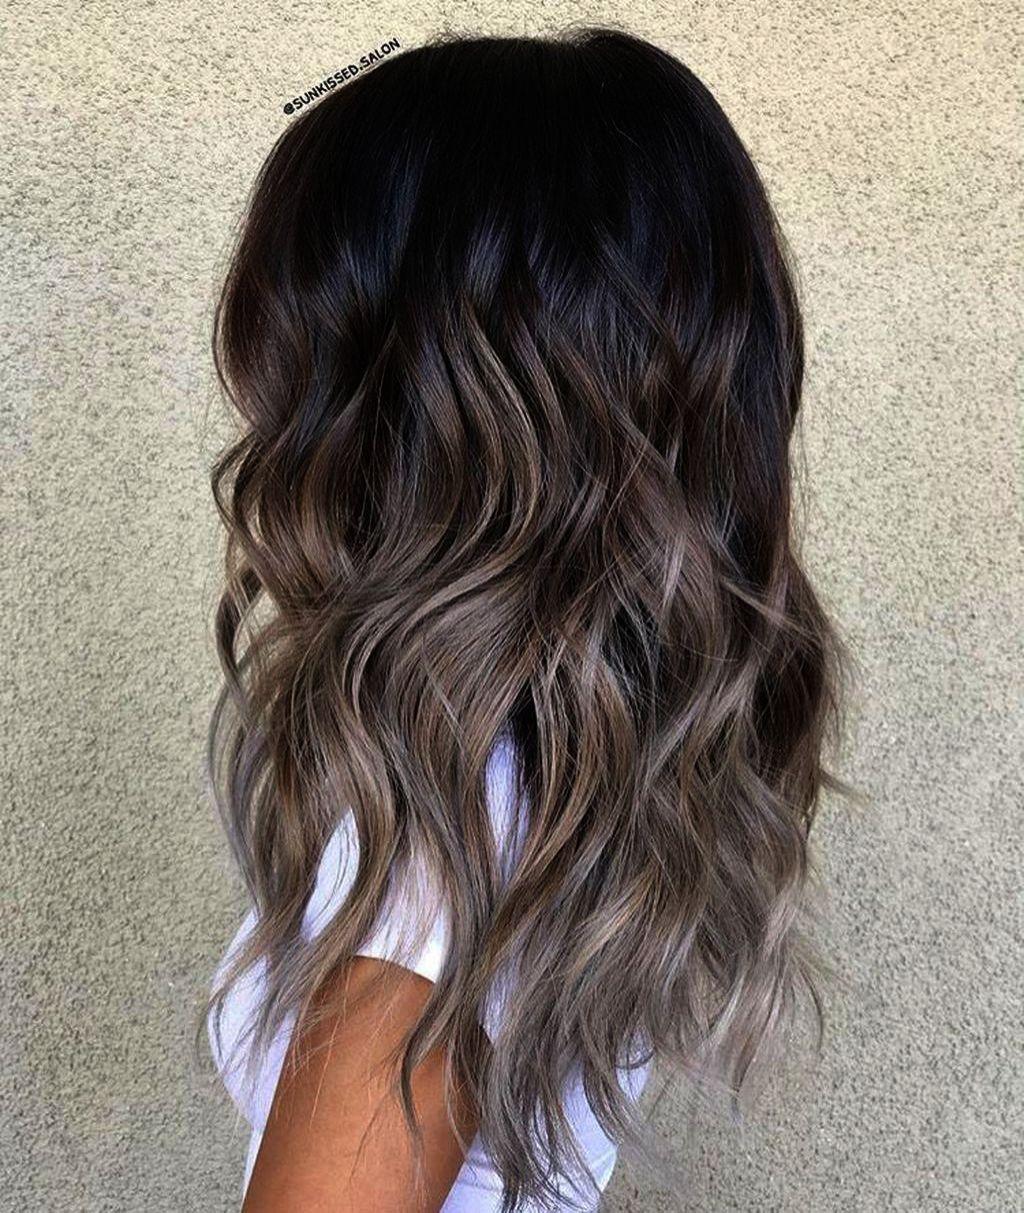 Haircut Near Me Citrus Hills Both Hair Color Ideas For Tan Skin And Brown Eyes Inside Hair Color Ideas For Br Ombre Hair Blonde Hair Styles Brown Hair Balayage